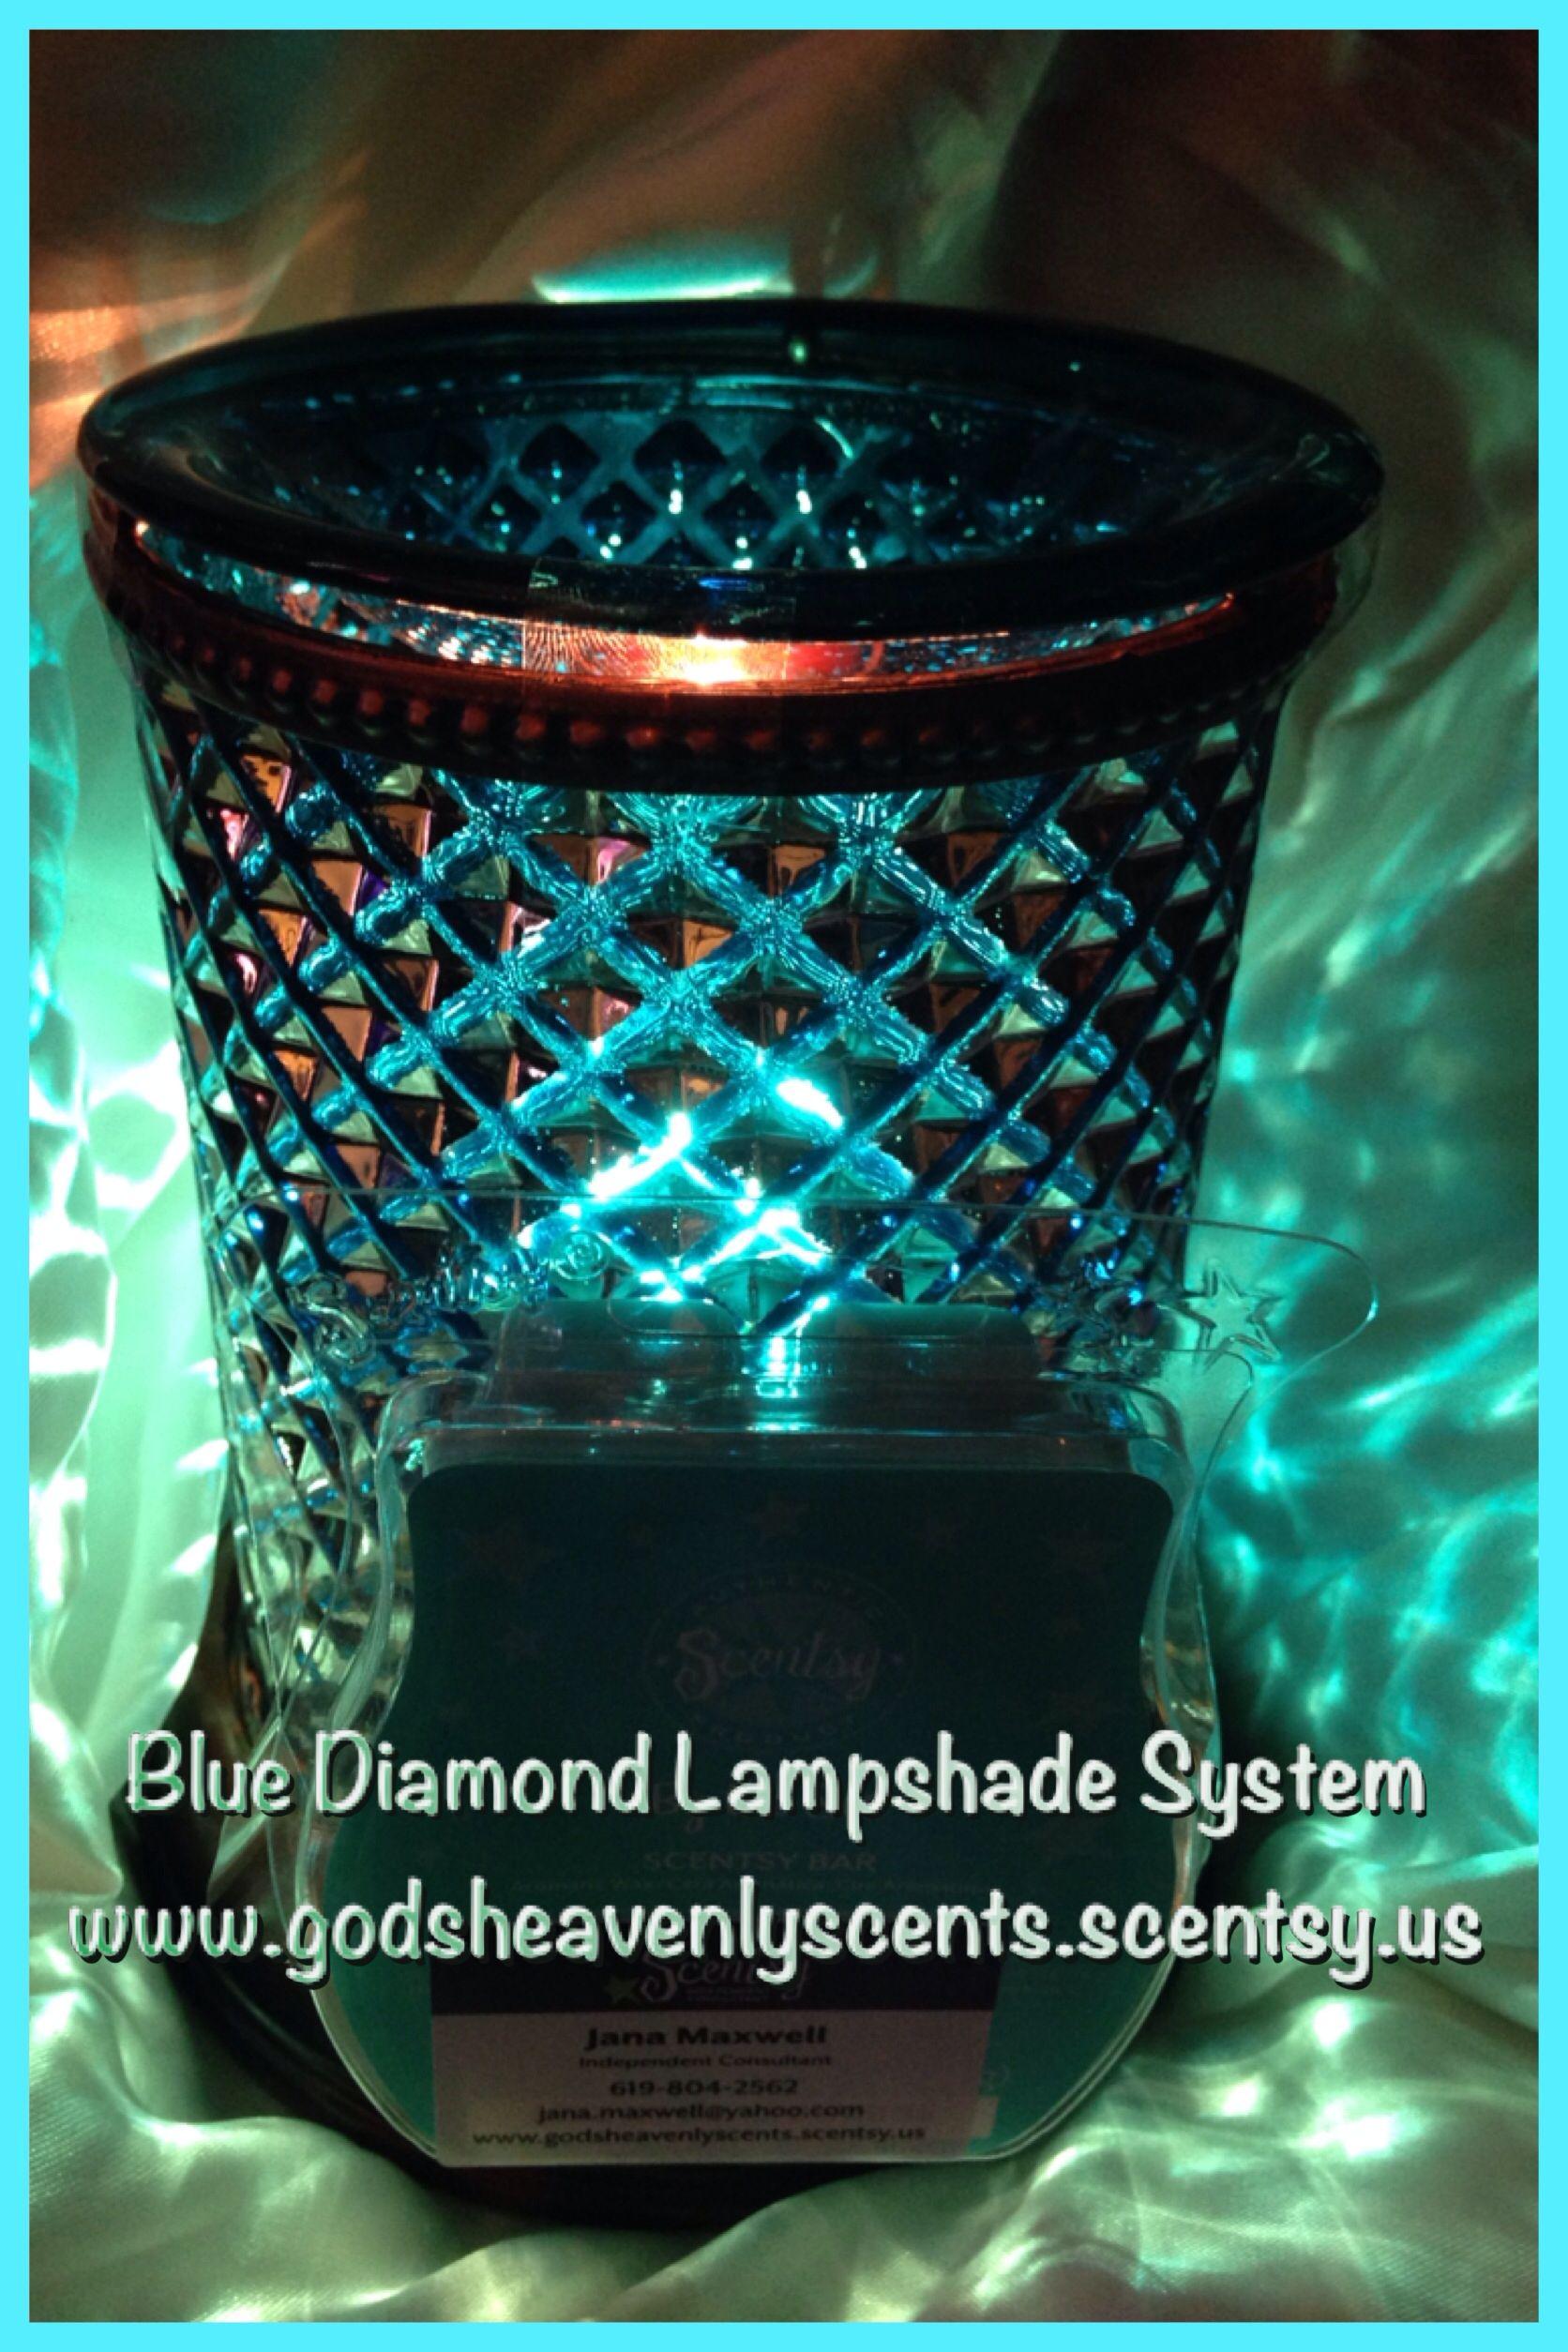 7b4a4b3fef0cd4ca17bb0dd6d4374df6 Top Result 50 Unique Diamond Fire Glass Image 2017 Pkt6